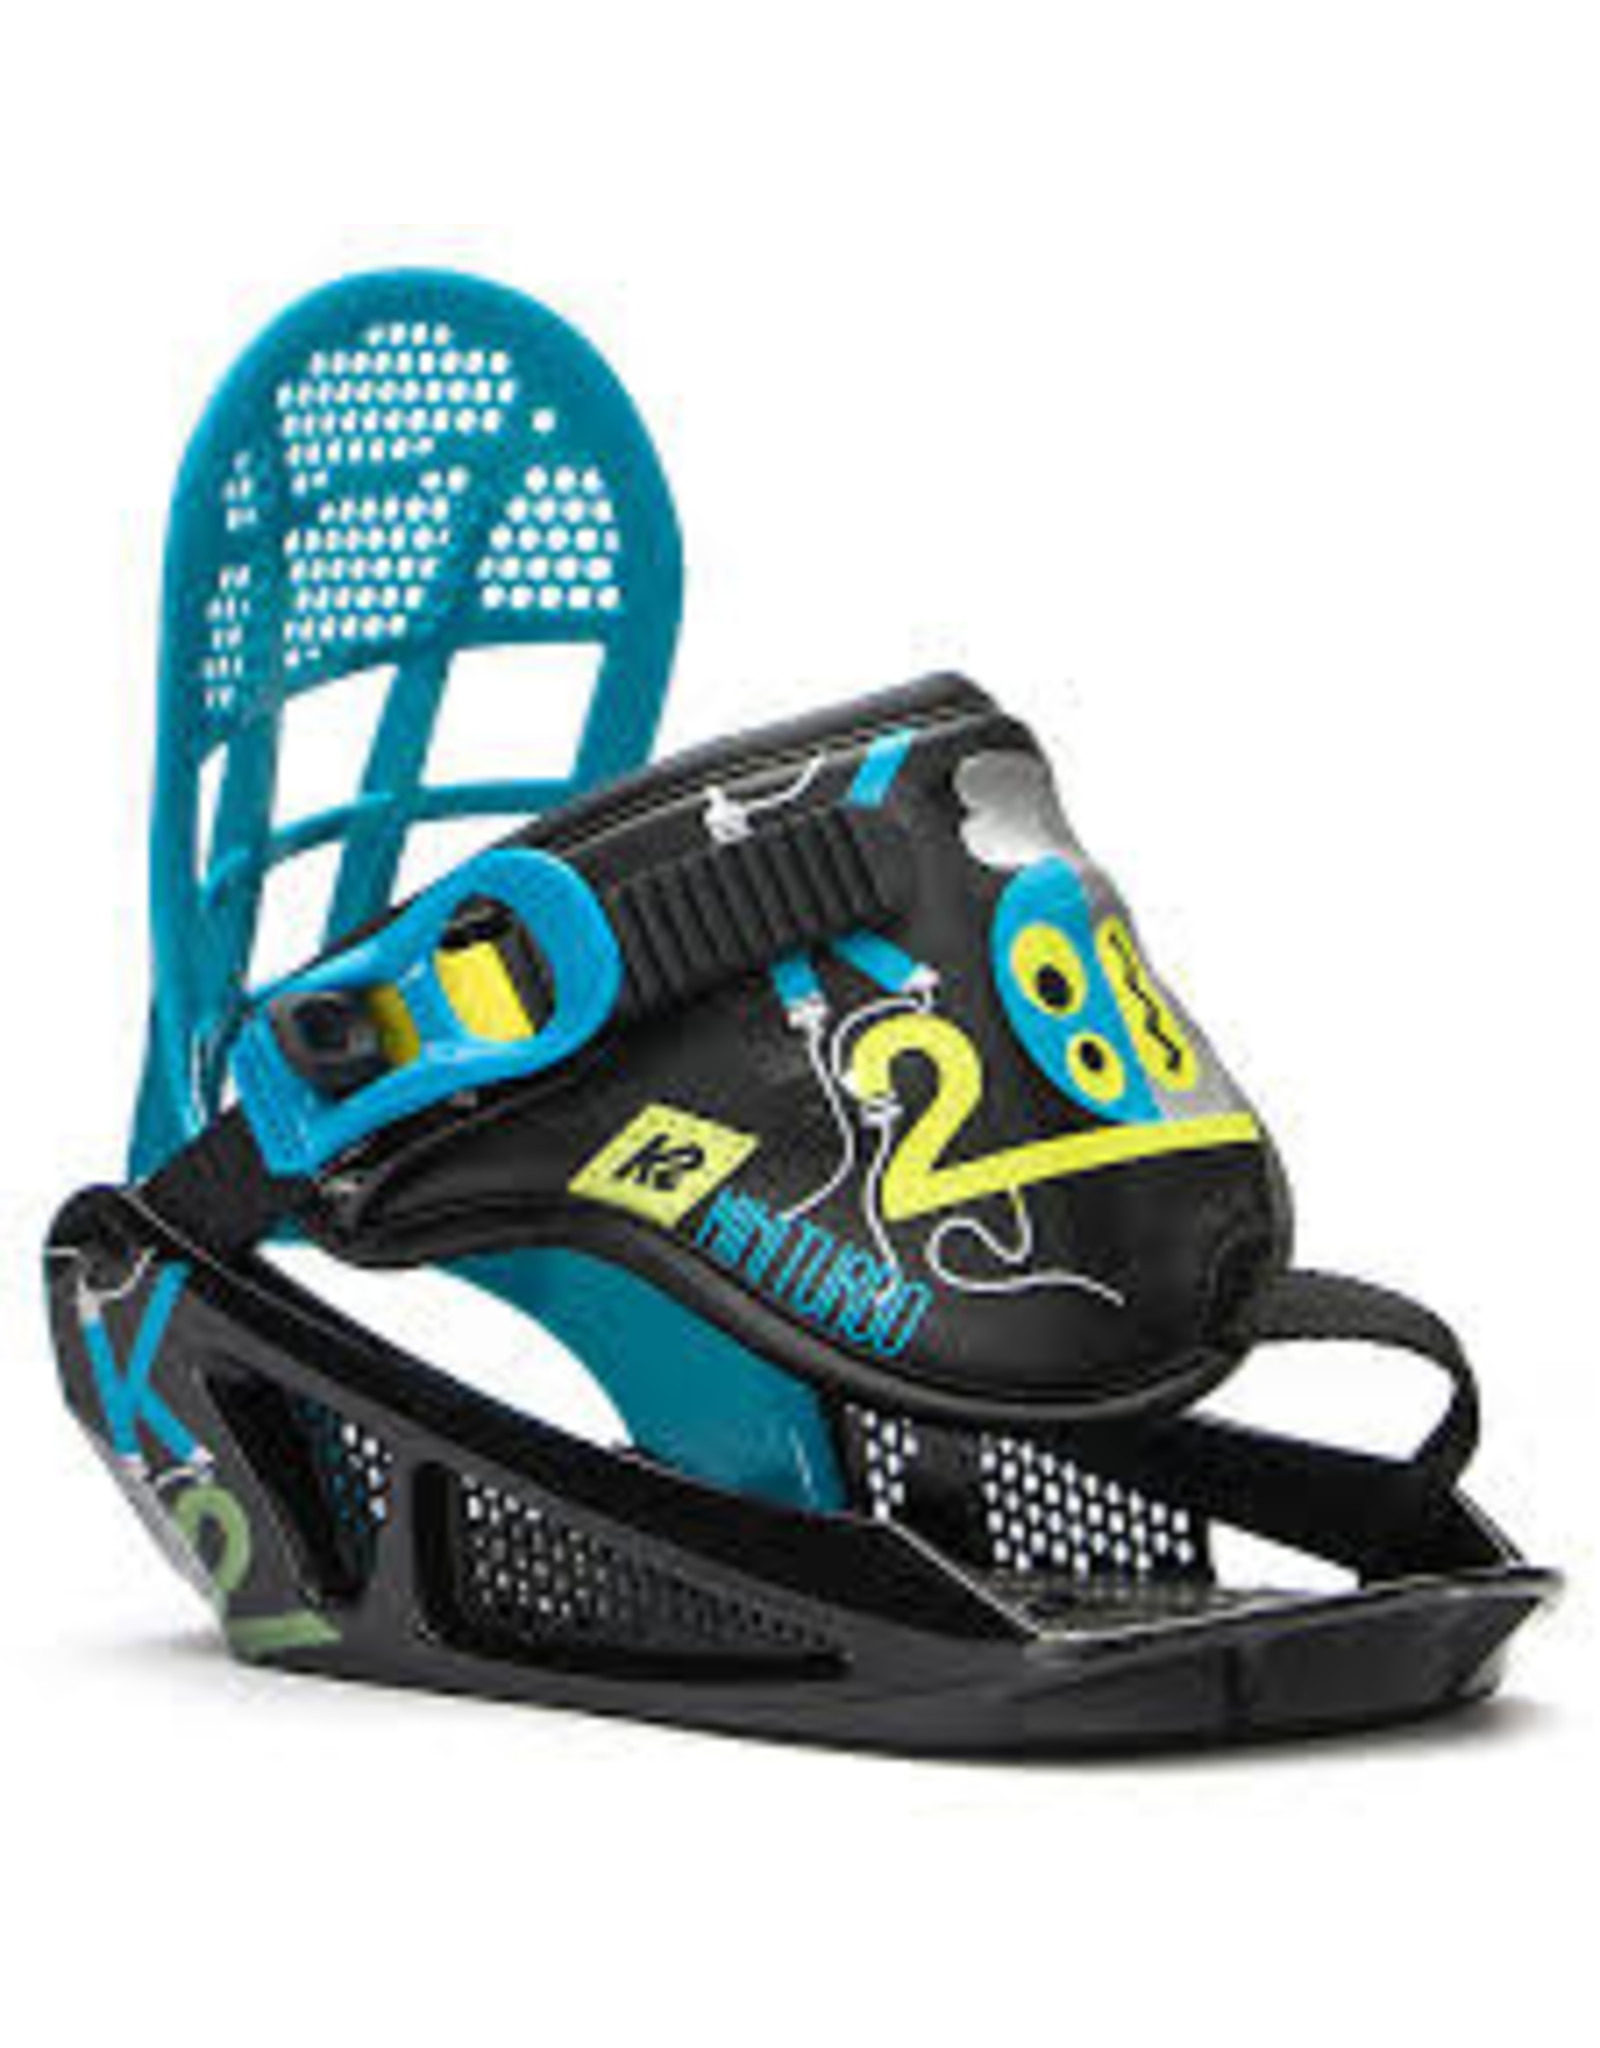 K2 K2 Mini Turbo Jr Snowboard Binding